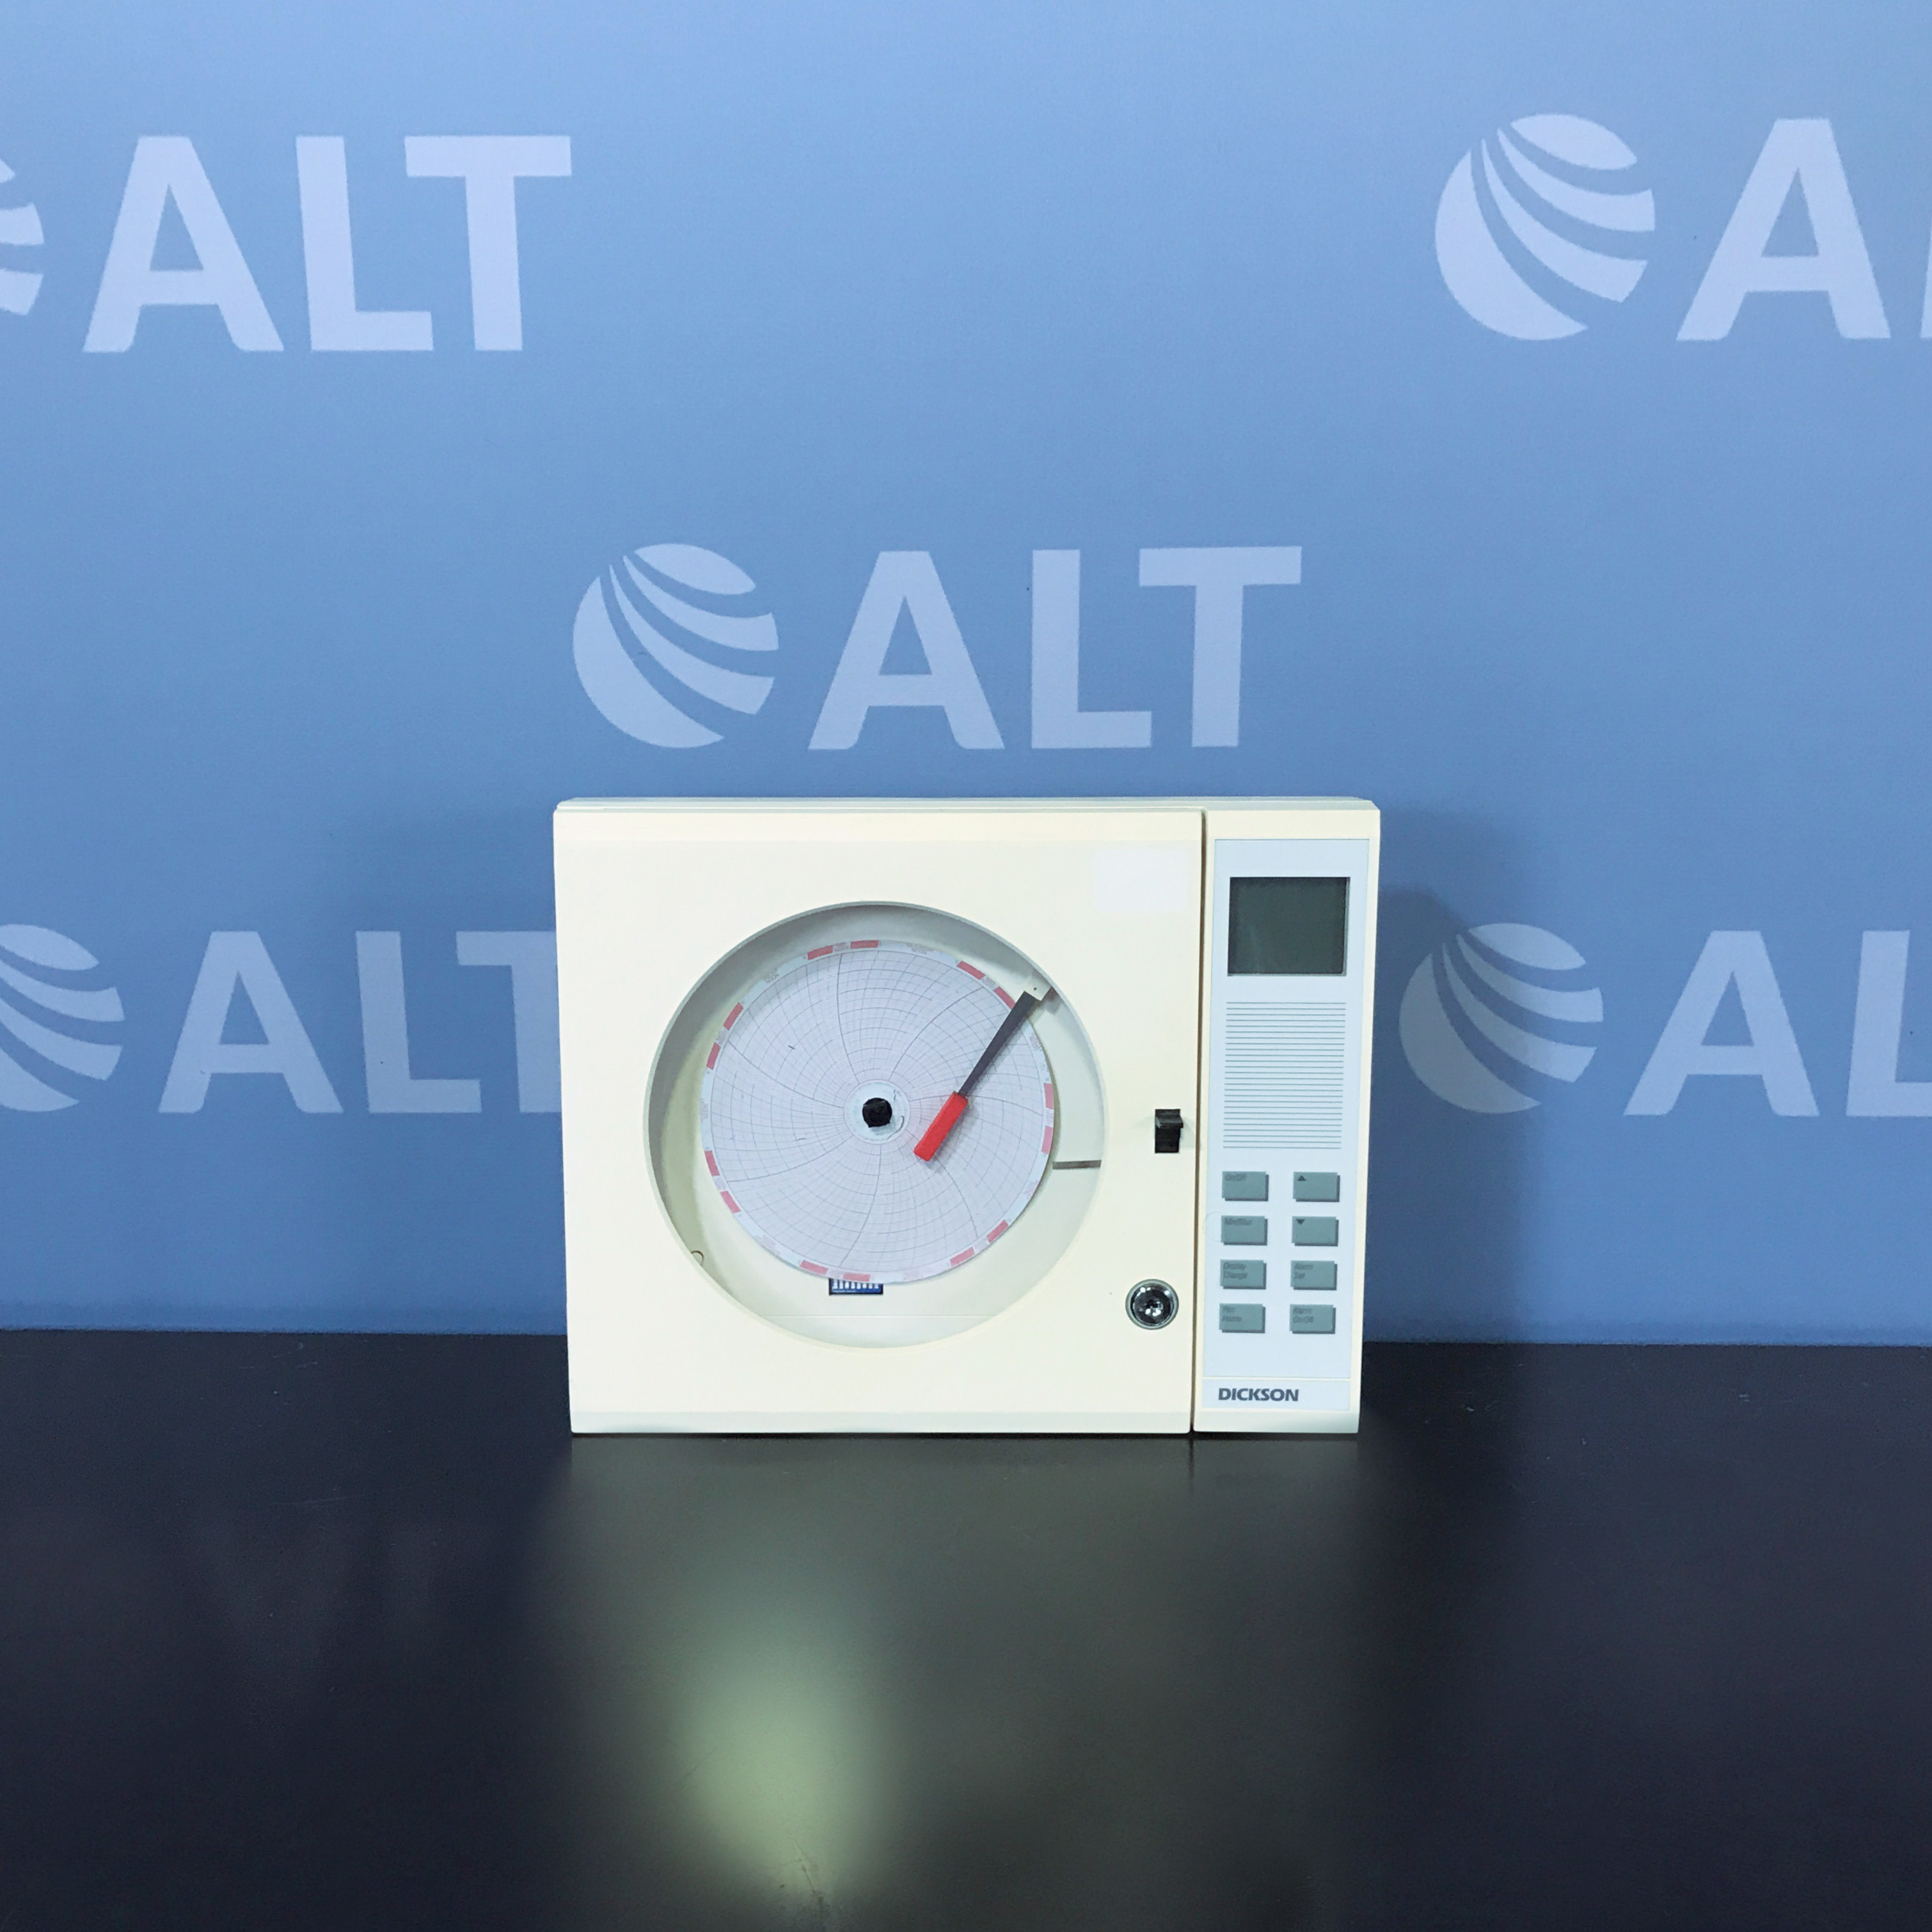 KTX C412 Temperature Recorder Name